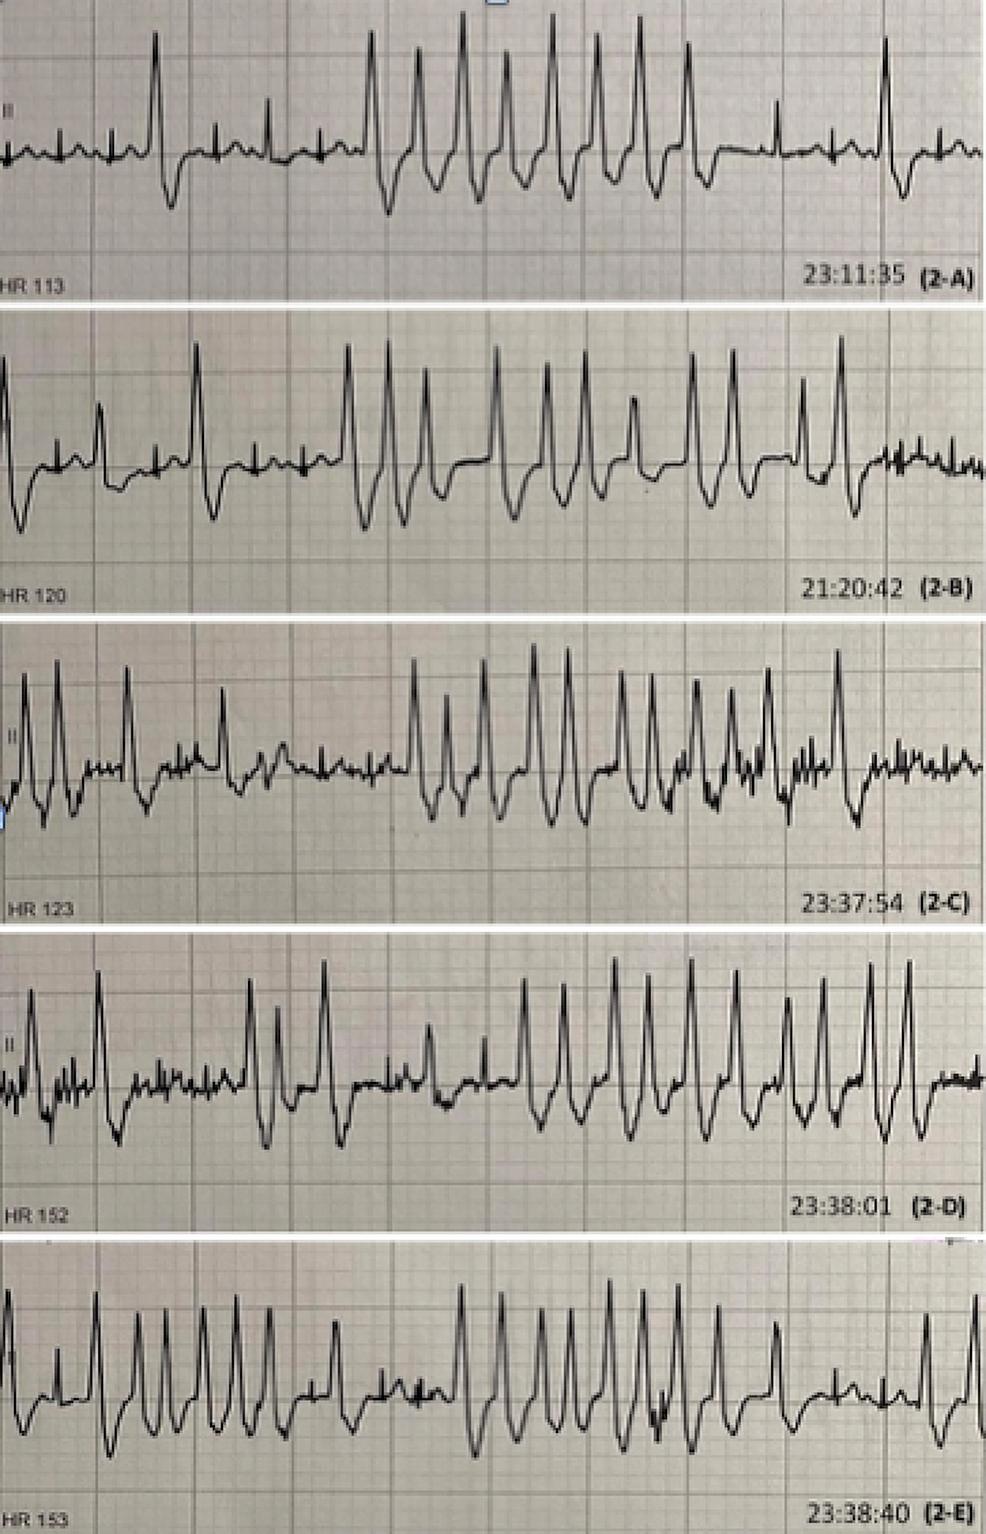 EKG-rhythm-strips-showing-multiple-episodes-of-NSVT.